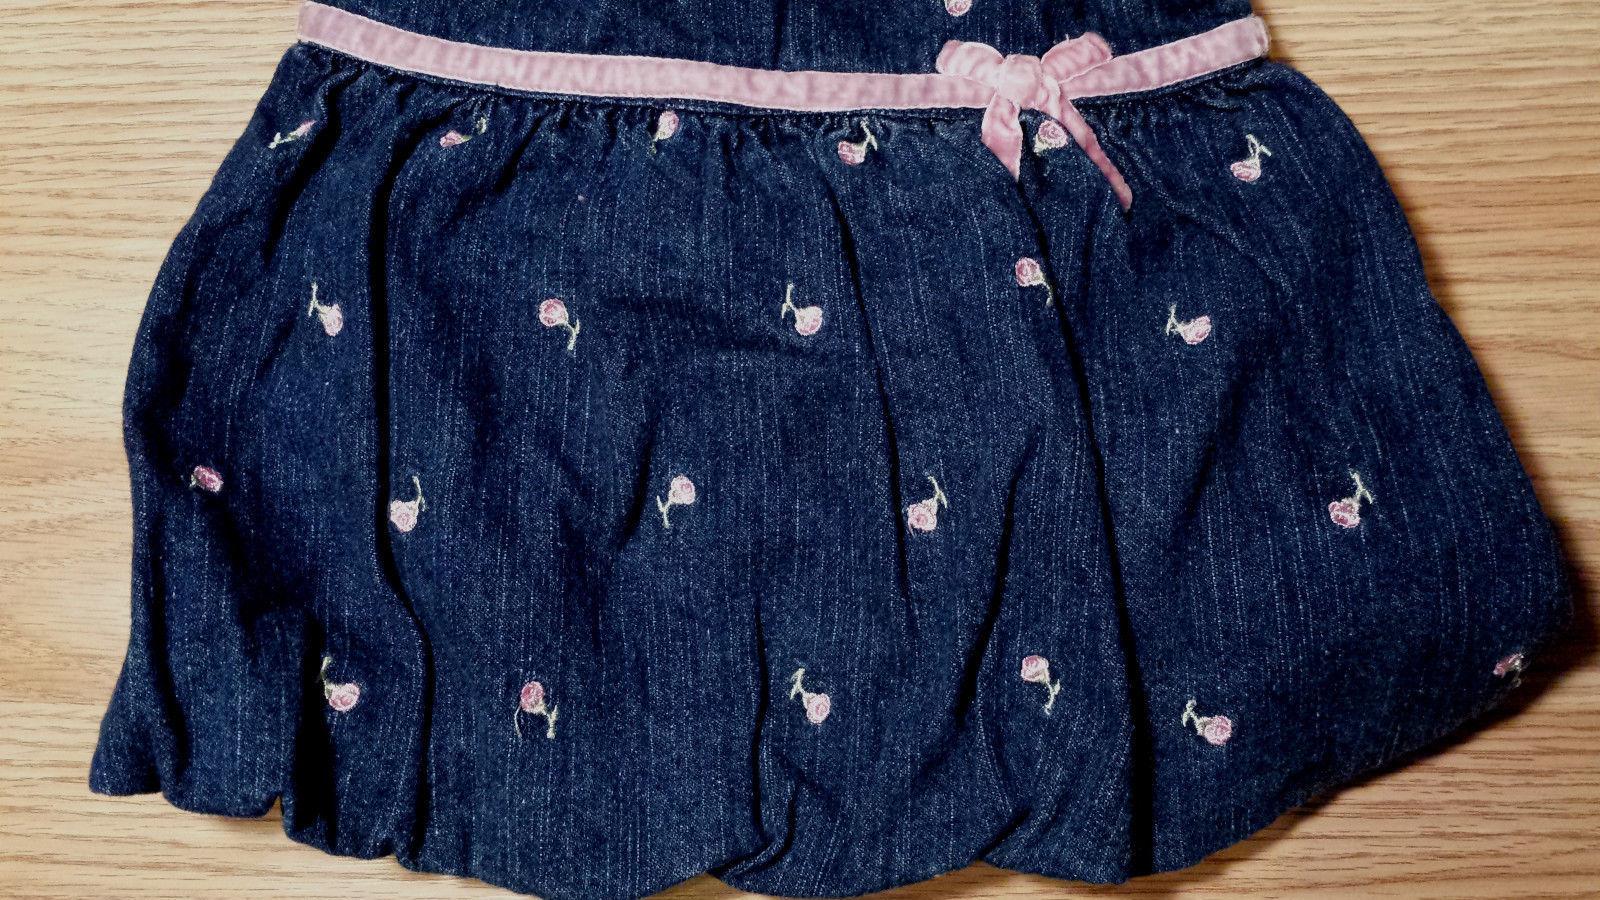 Girl's Size 3-6 M Months 2 Pc Dark Blue Denim Rose Embroidered FG Dress + Top